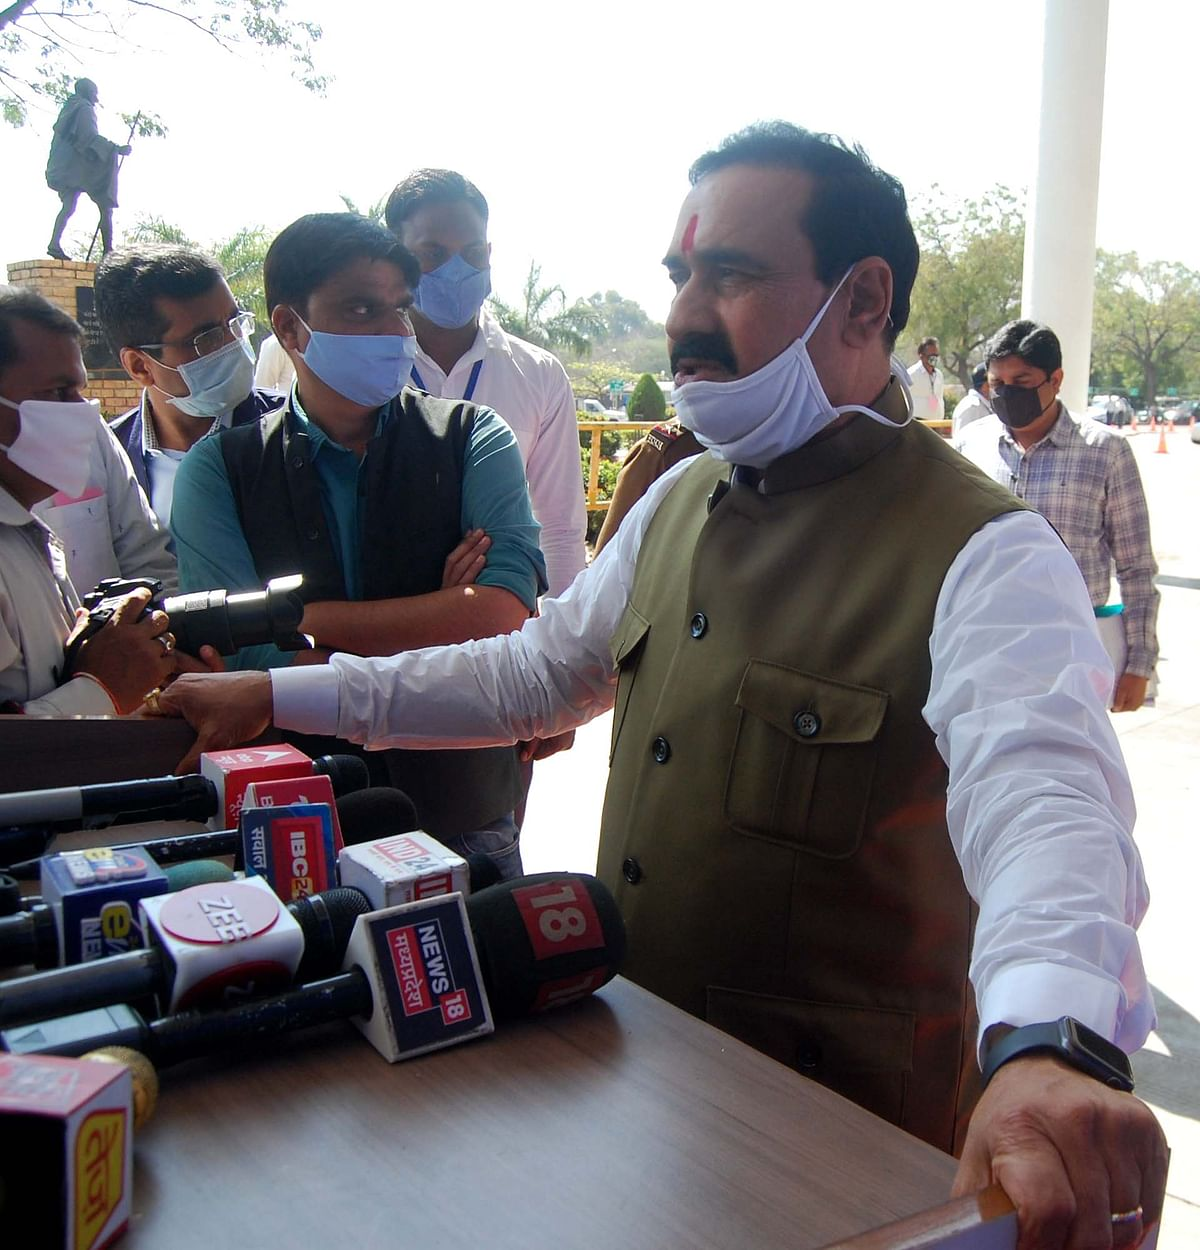 Madhya Pradesh: Home Minister Narottam Mishra, MLA Lakhan Singh Yadav level allegations against each other over mining in Bhitarwar area of Gwalior